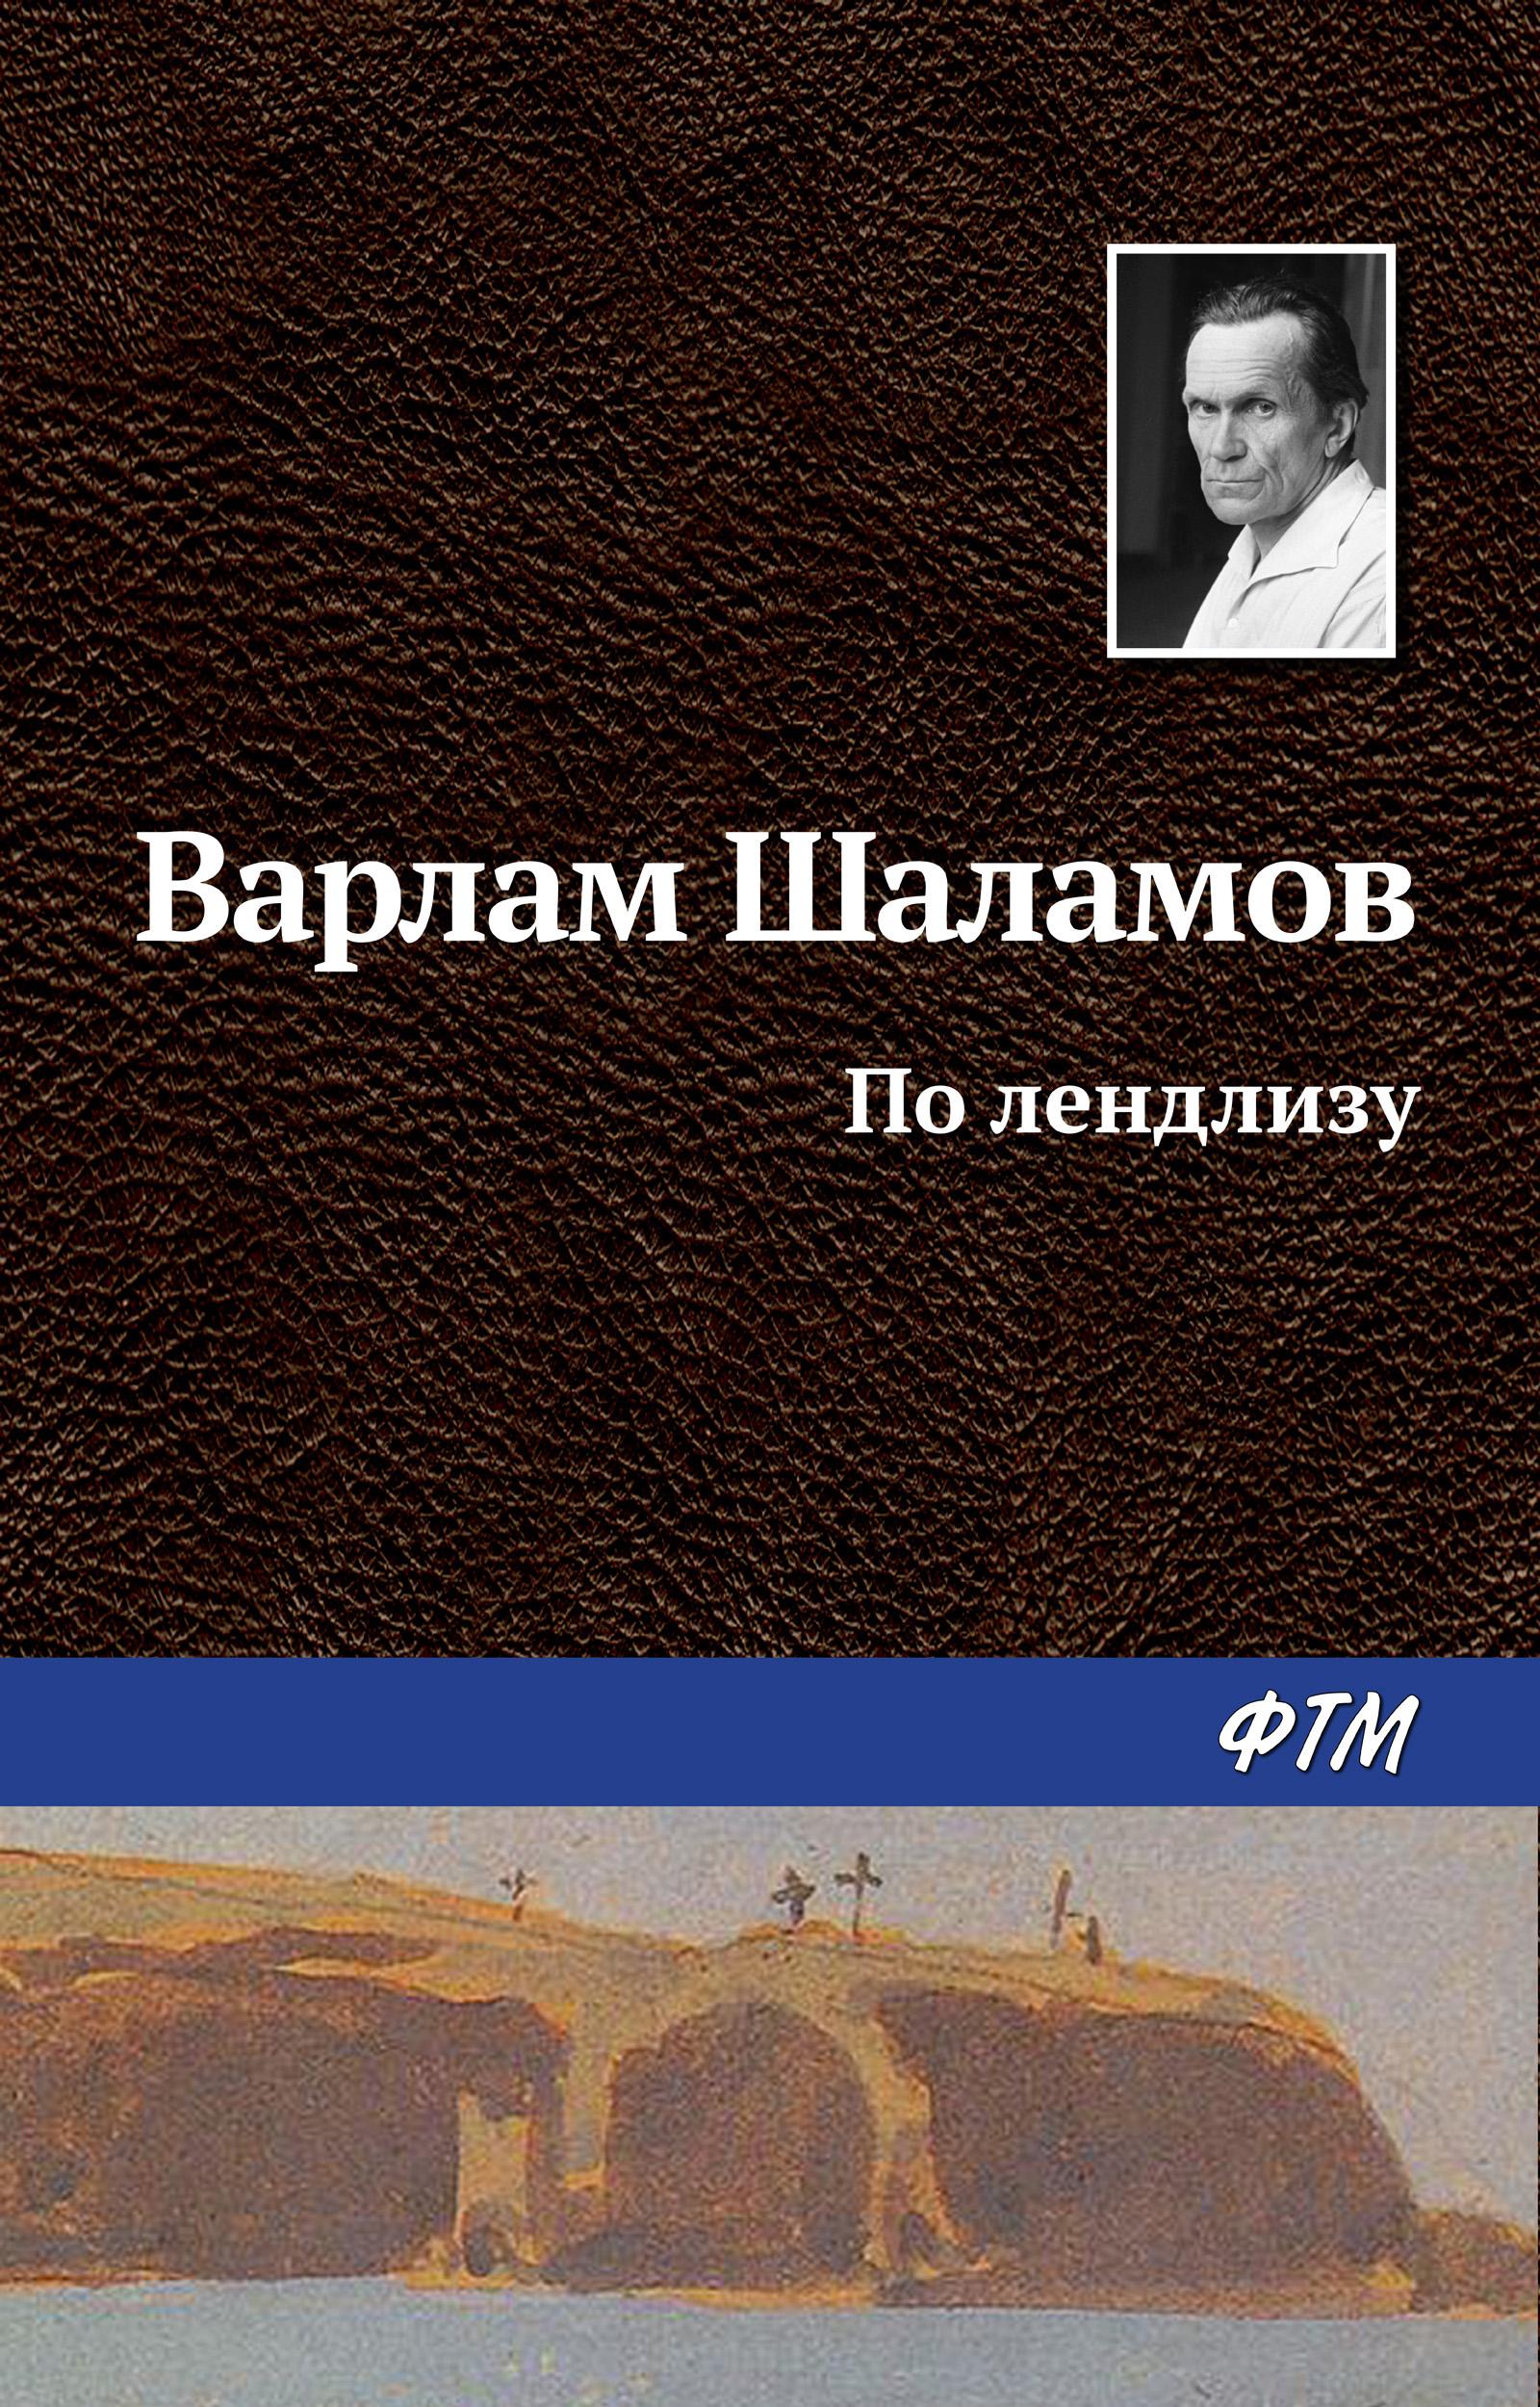 Варлам Шаламов По лендлизу л в жаравина у времени на дне эстетика и поэтика прозы варлама шаламова монография